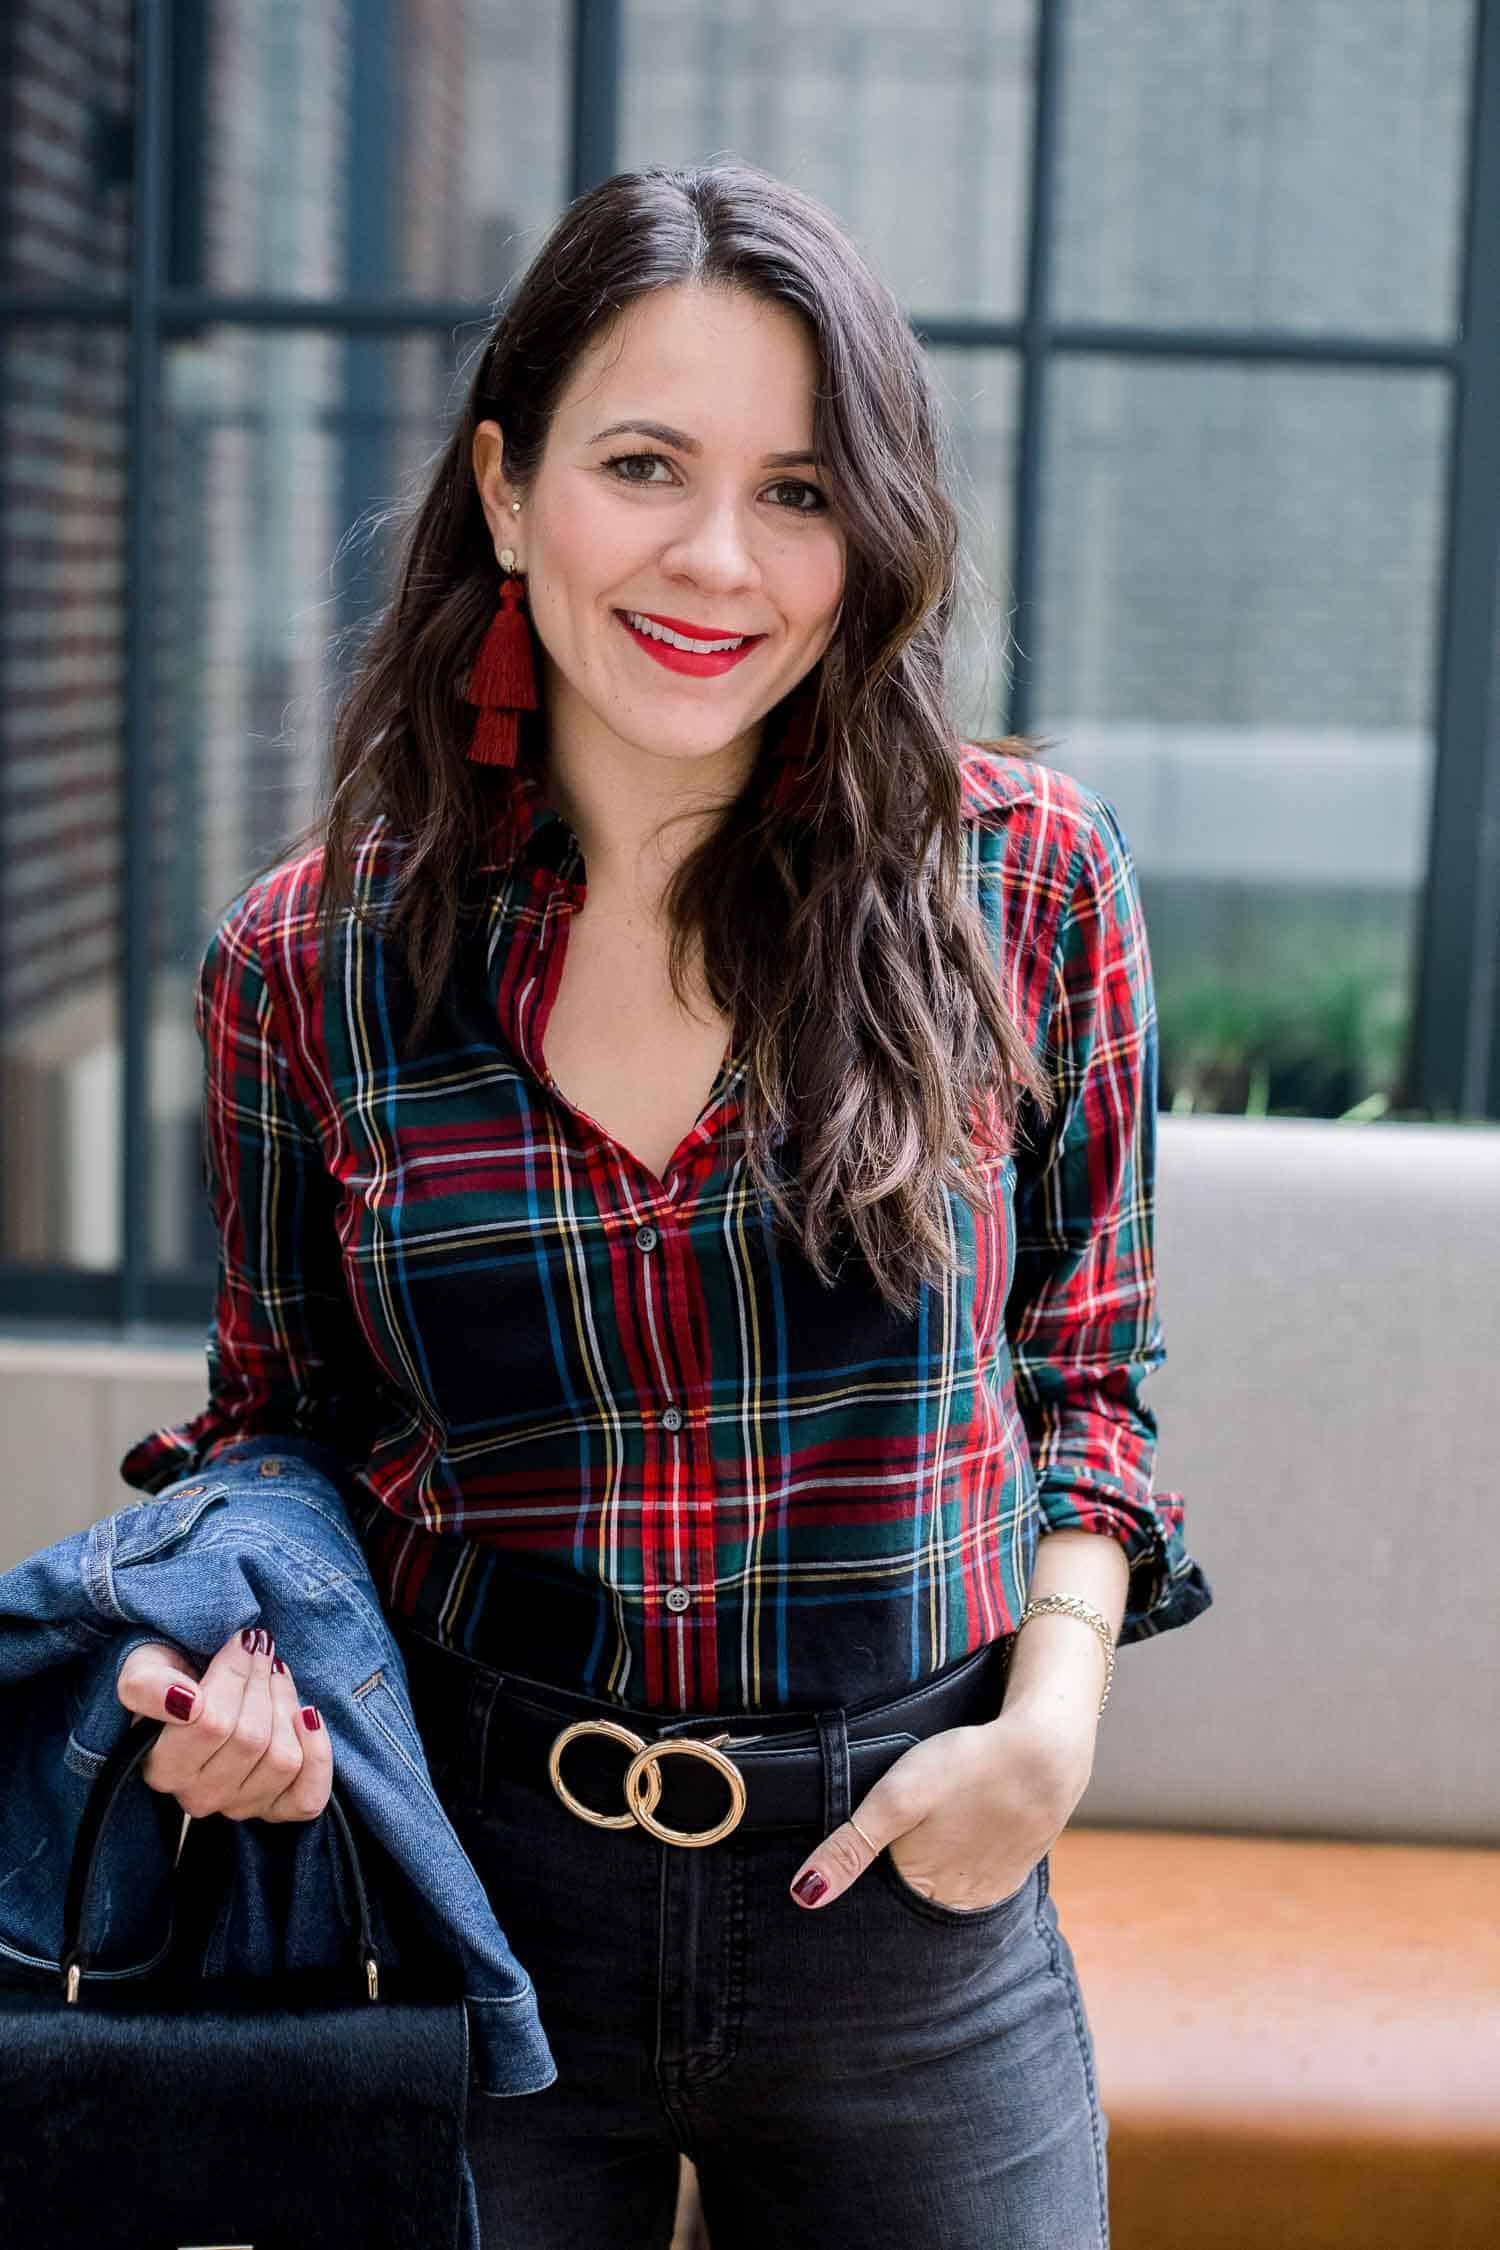 J. Crew Tartan Cotton Button Down • Madewell Jeans • Denim Jacket • Hart Earrings - My Style Vita